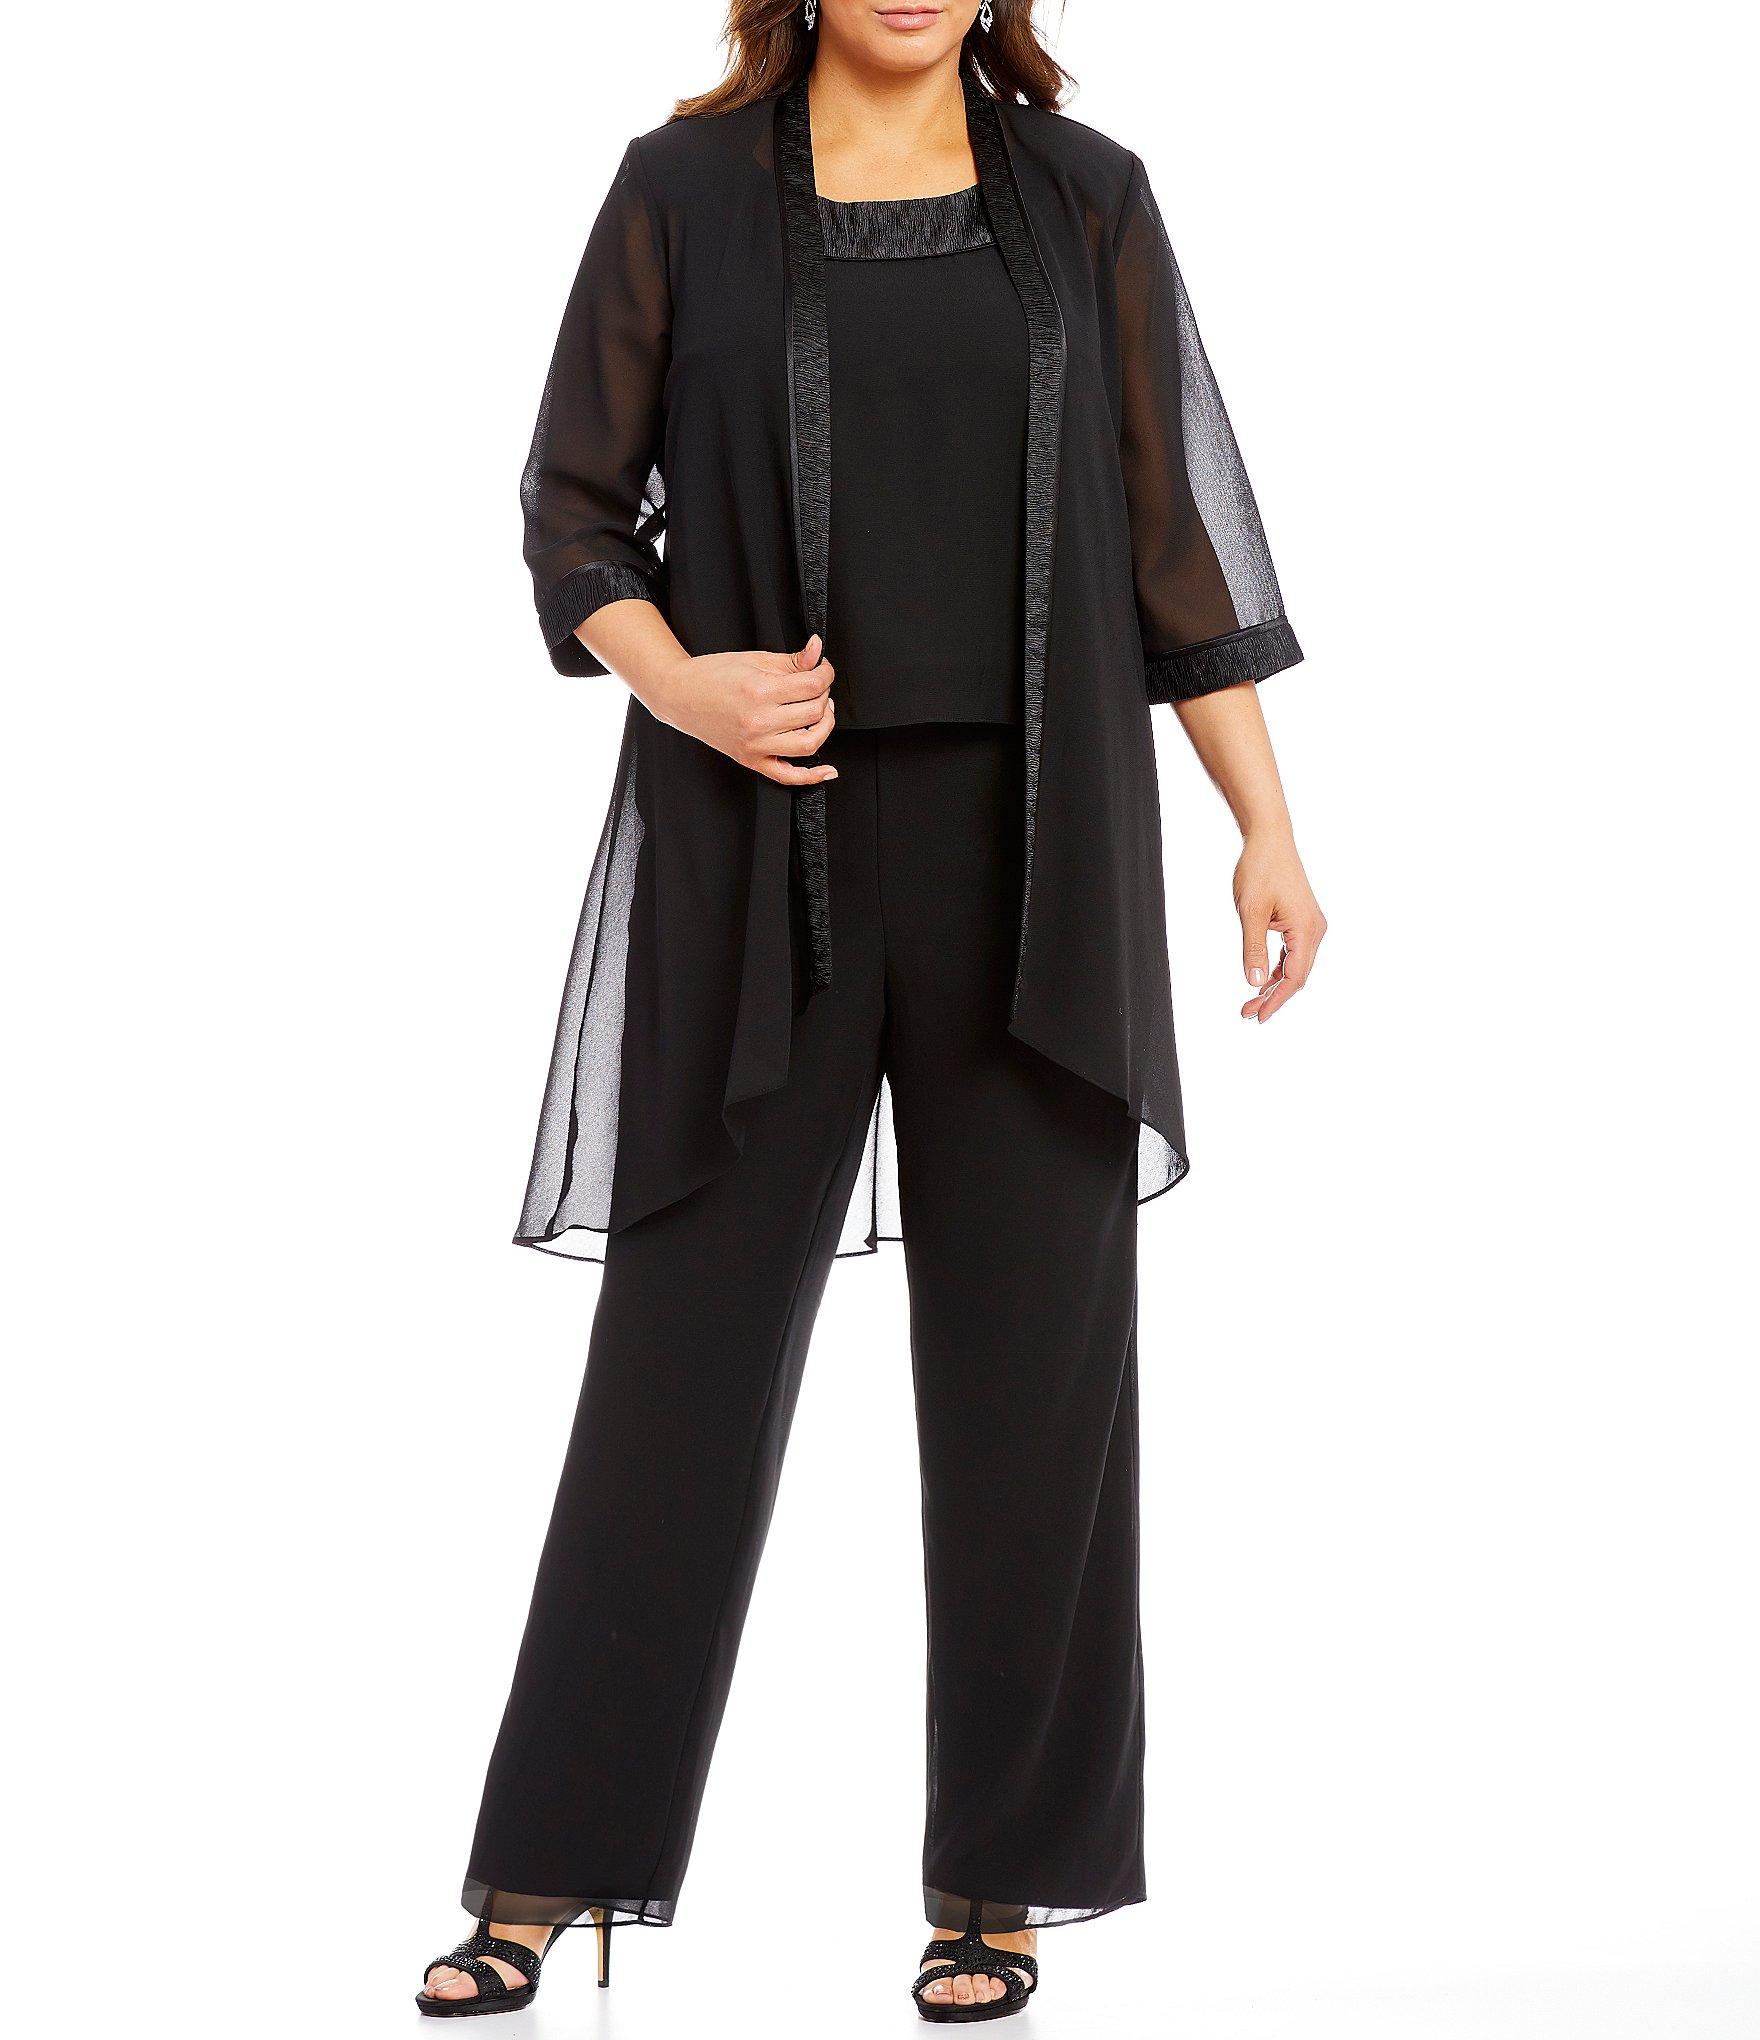 Dillards black dress plus size